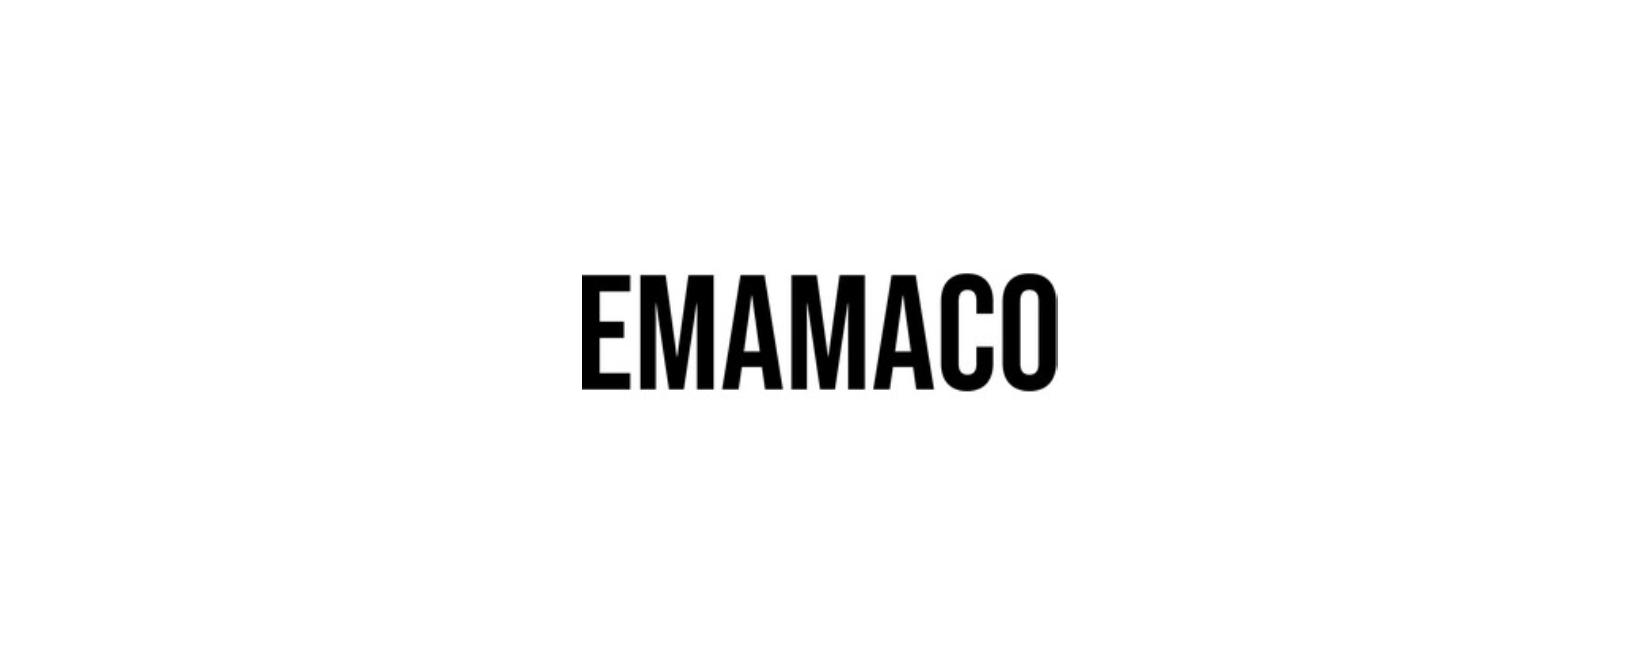 Emamaco AU Discount Code 2021